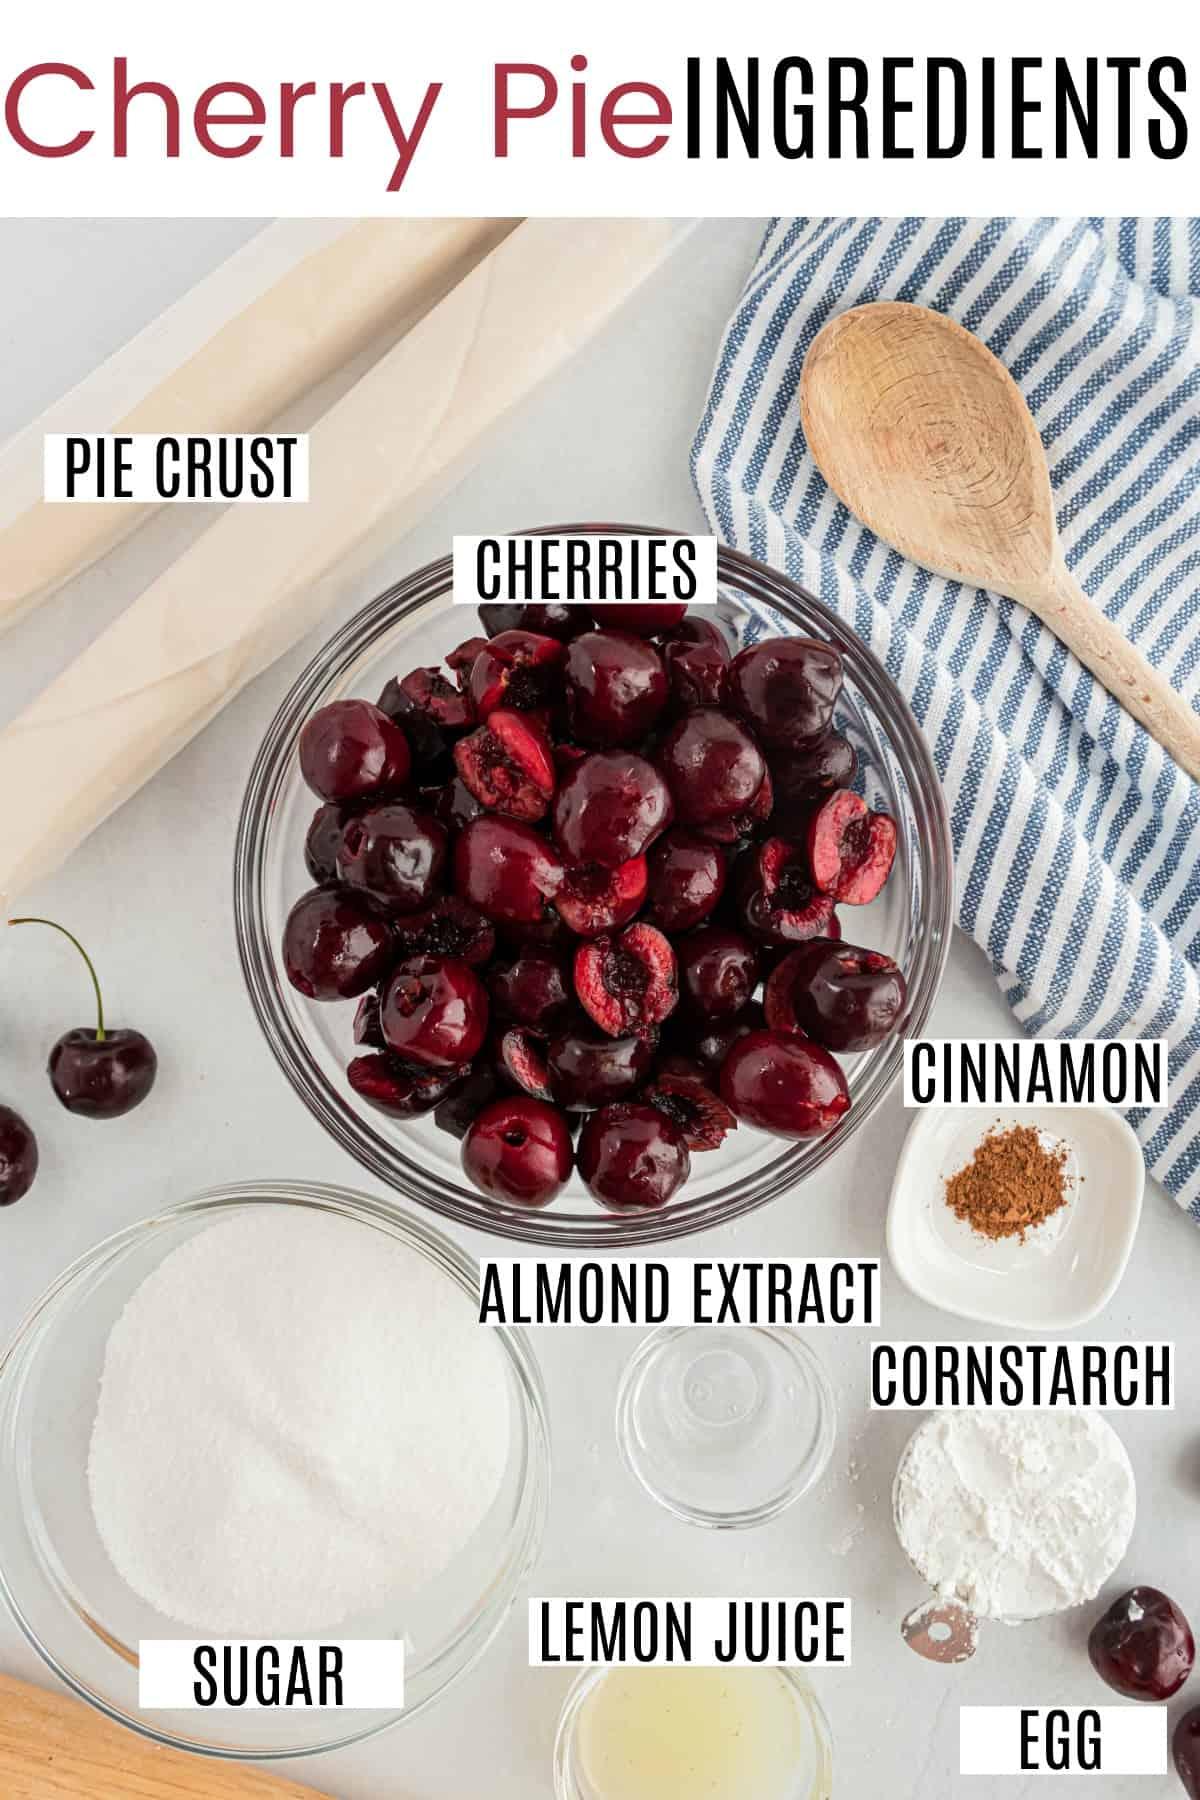 Cherry pie ingredients including pie crust, fresh cherries, and sugar.